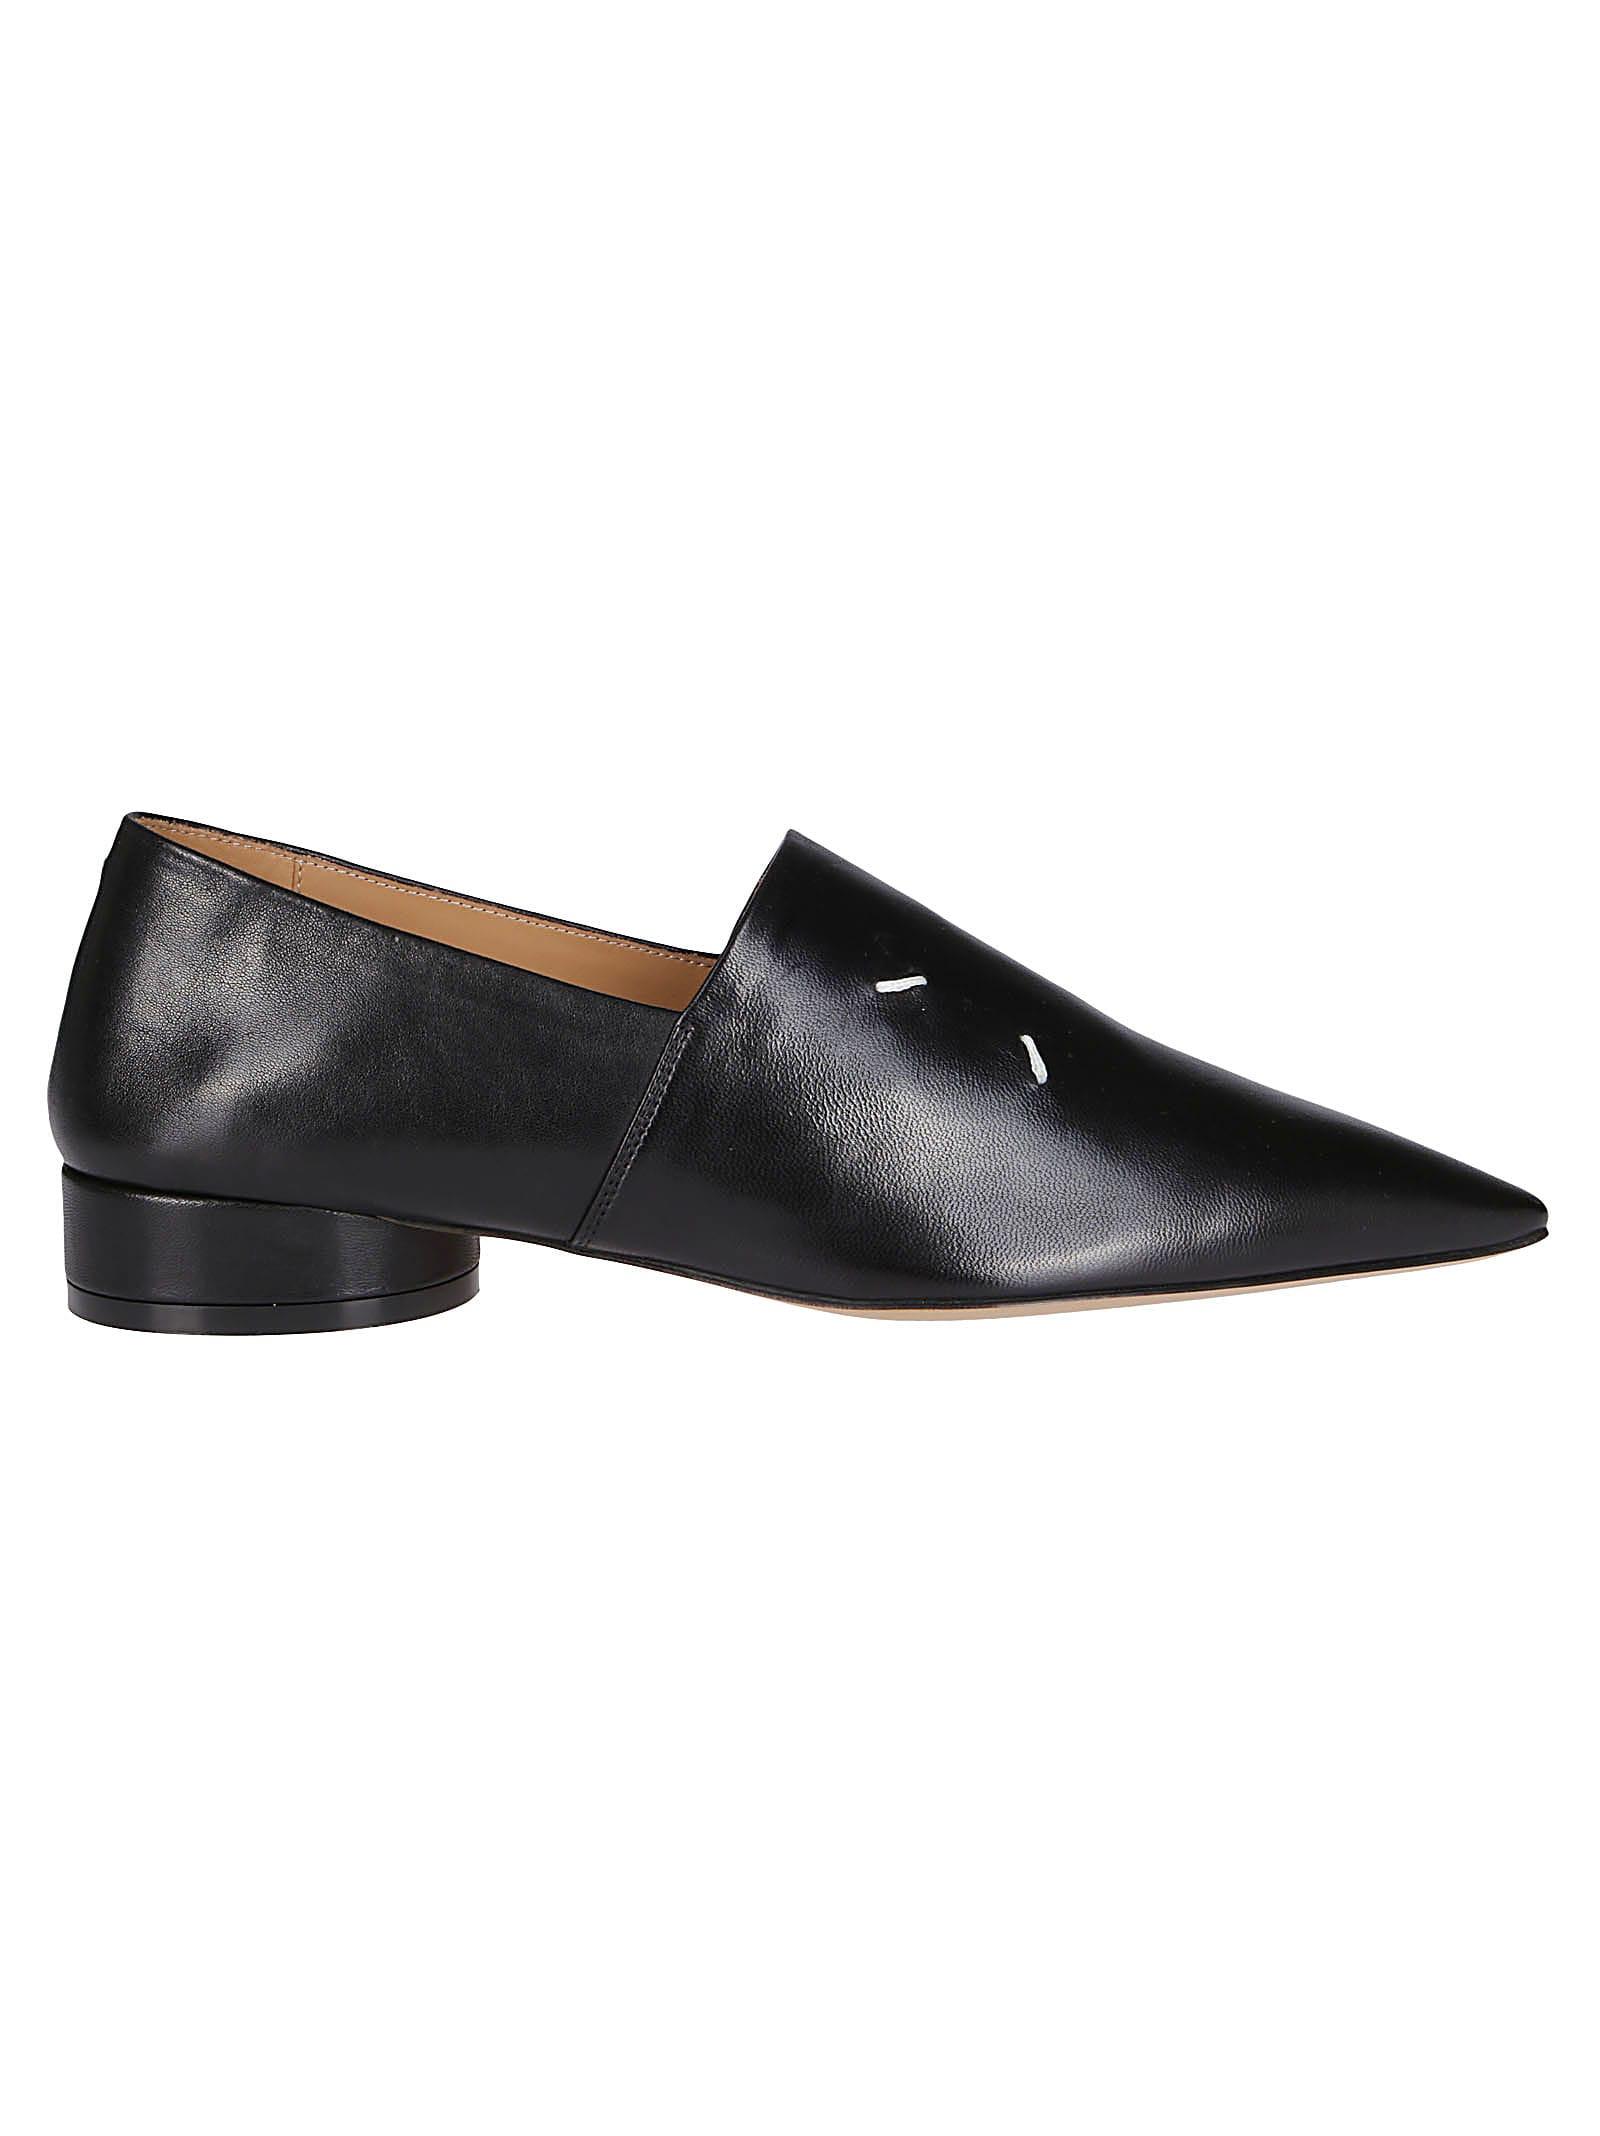 Buy Maison Margiela Black Leather Loafers online, shop Maison Margiela shoes with free shipping